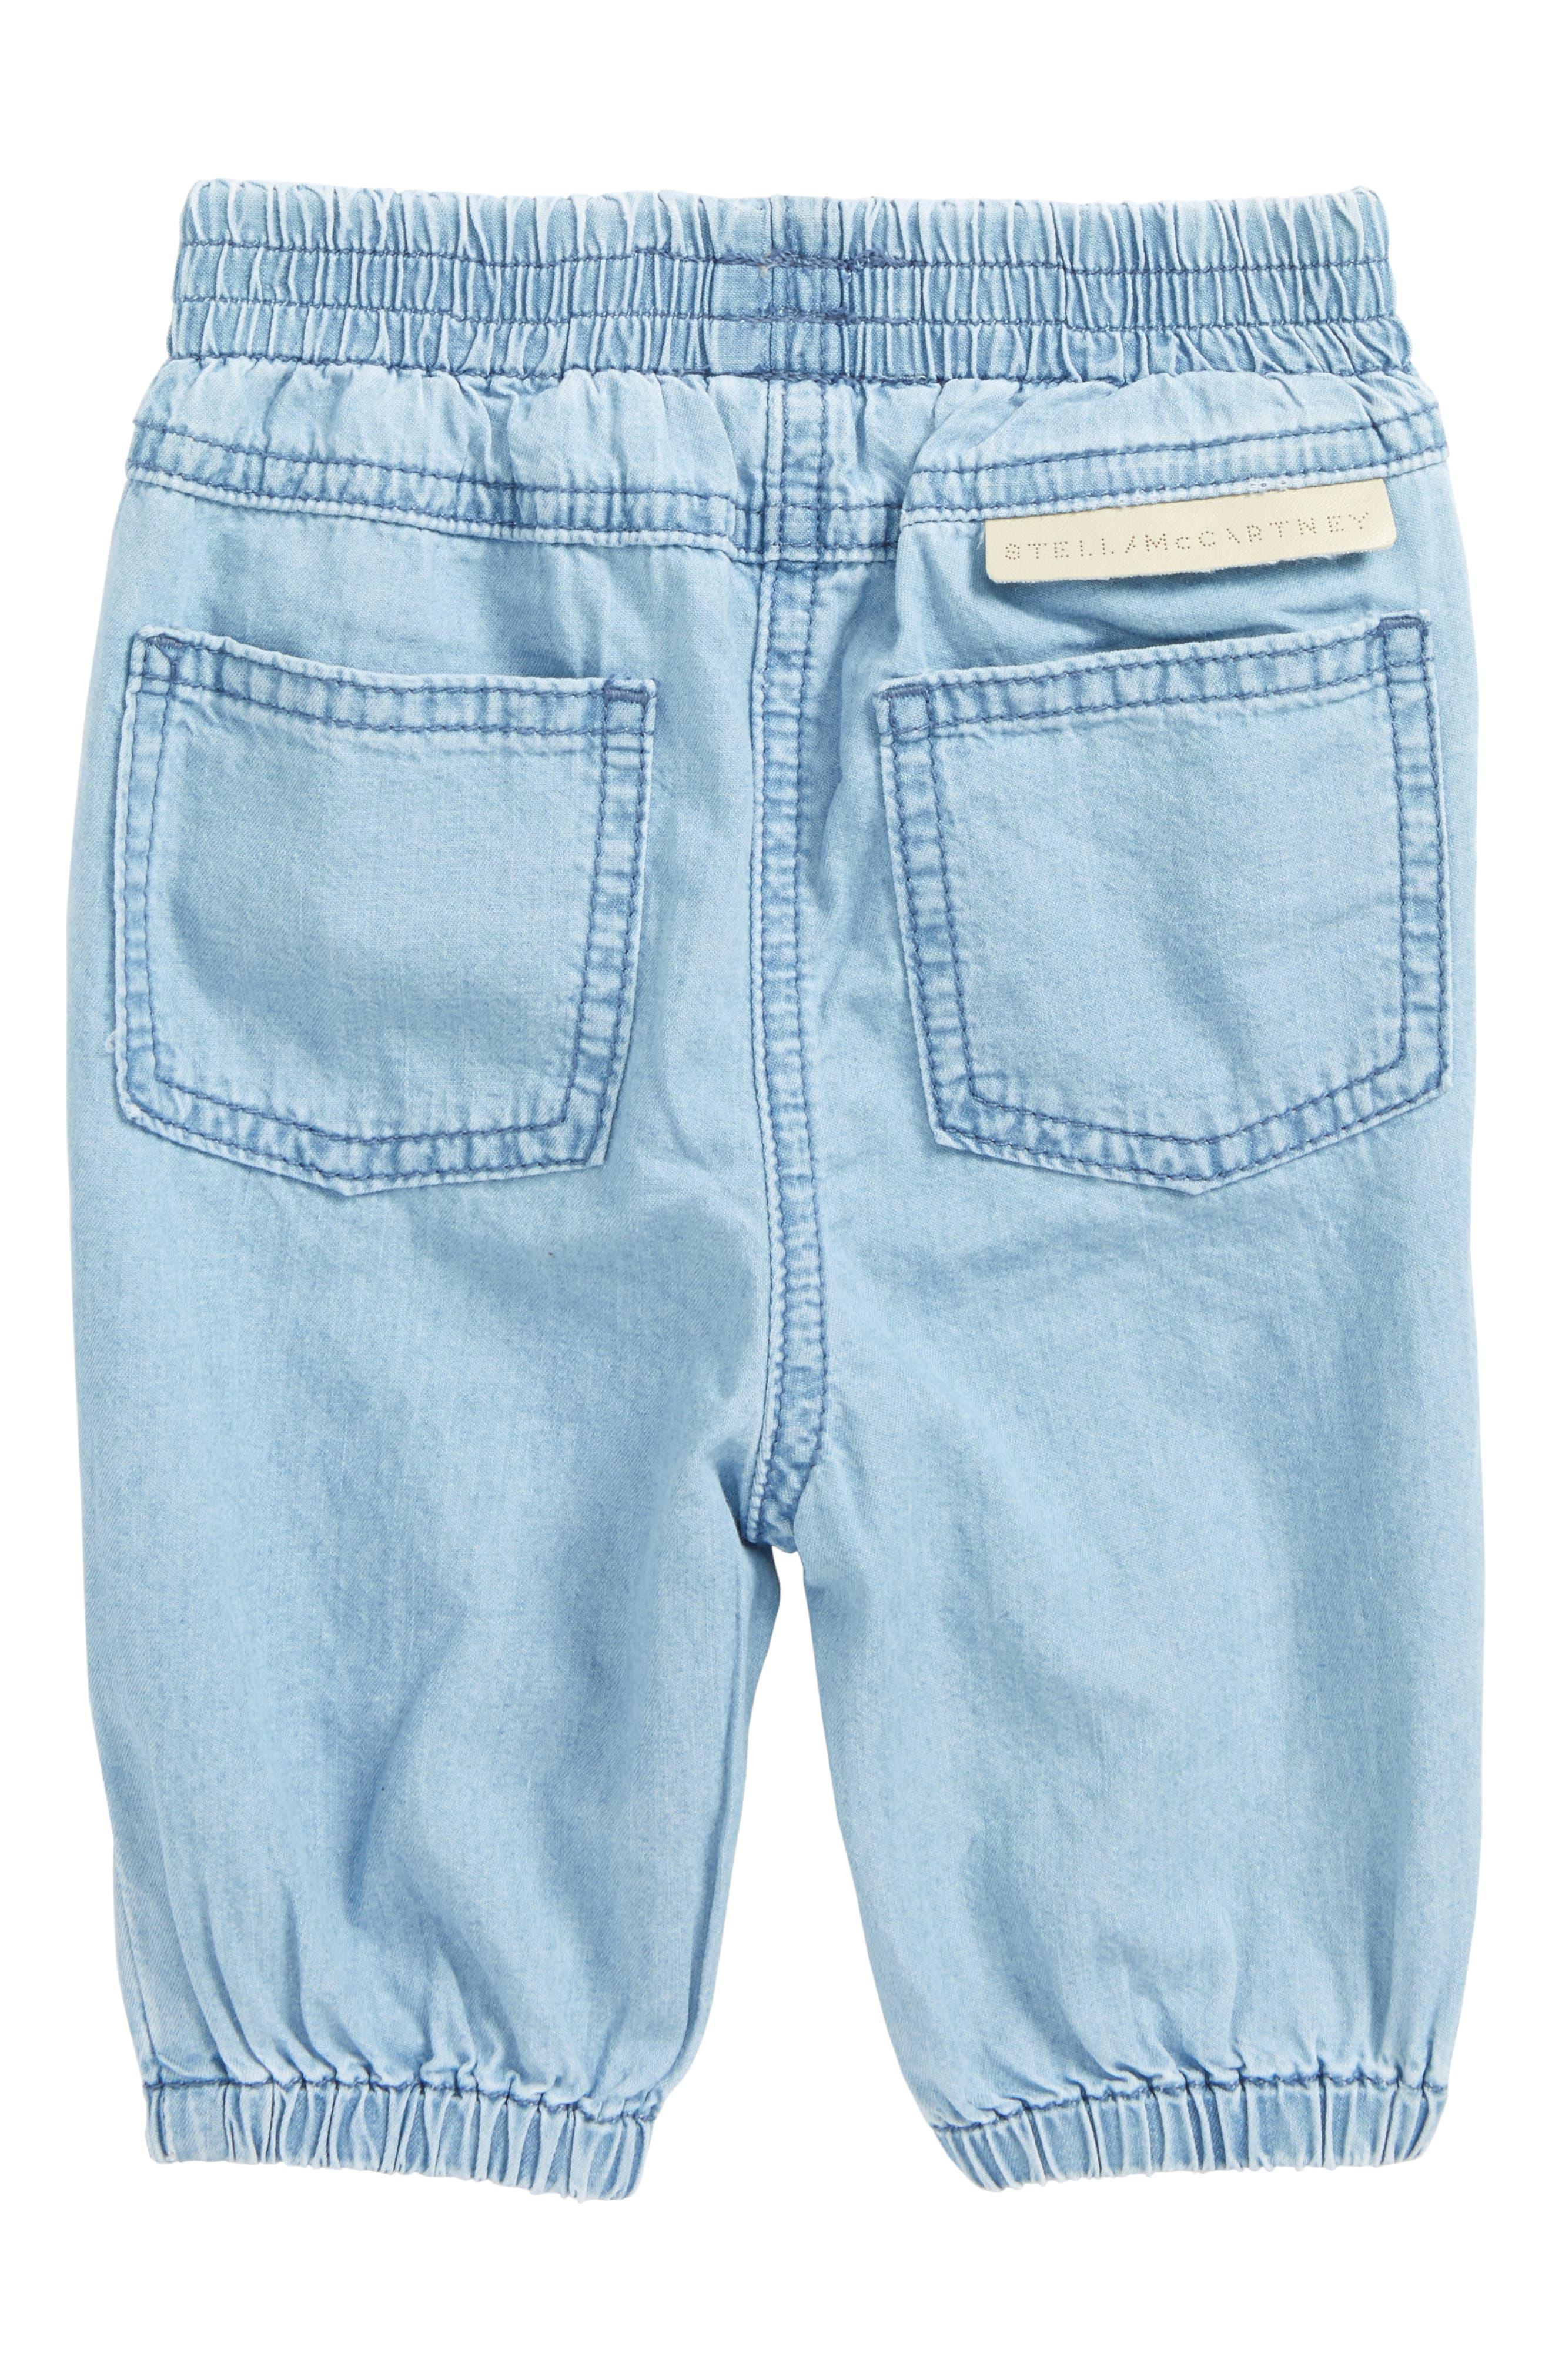 Pipkin Chambray Pants,                             Alternate thumbnail 2, color,                             Denim